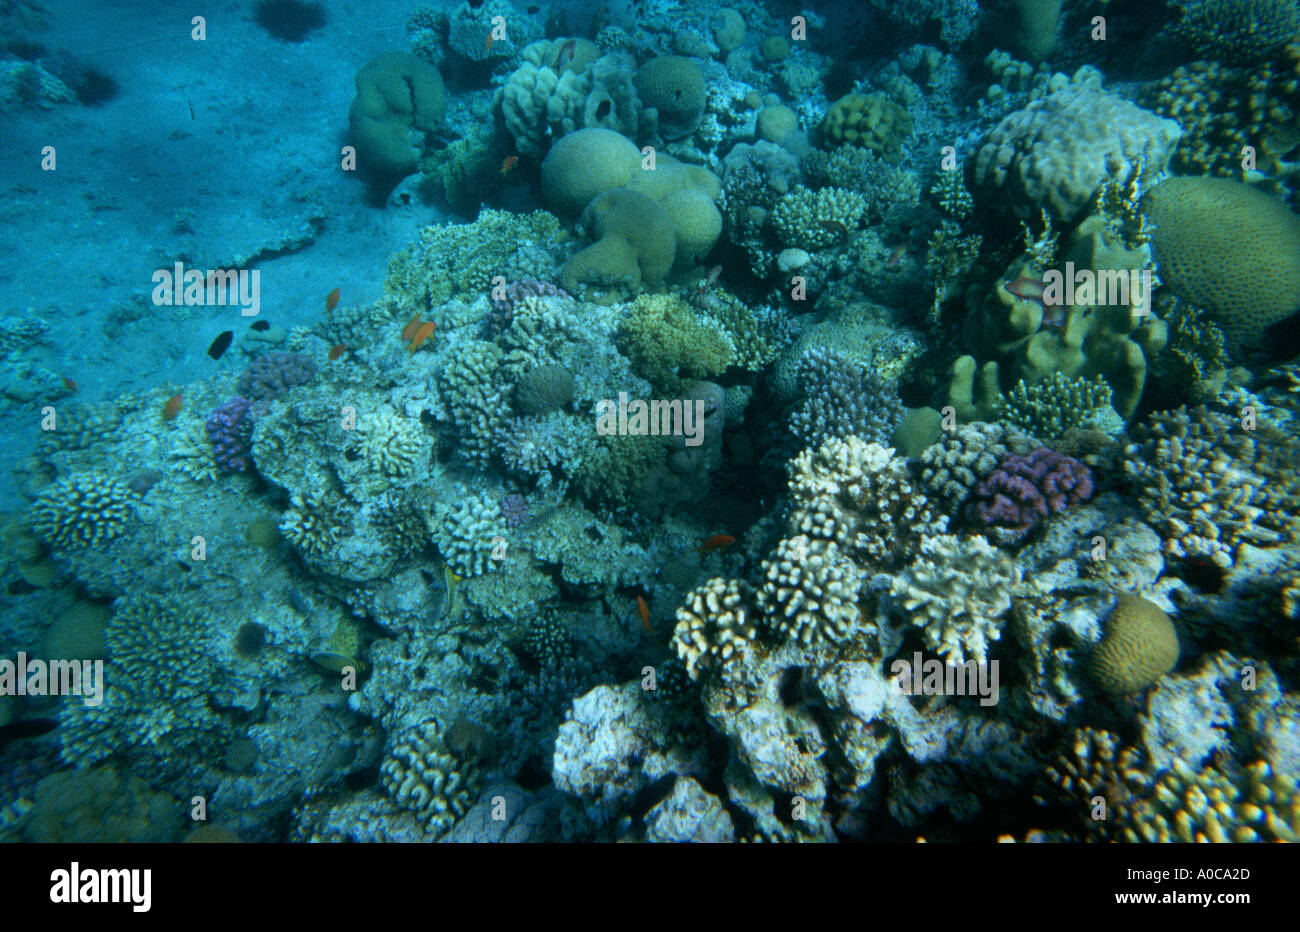 JORDAN AQABA RED SEA the royal diving center Jordan Royal ecological Diving Society coral reef reefs fish Stock Photo